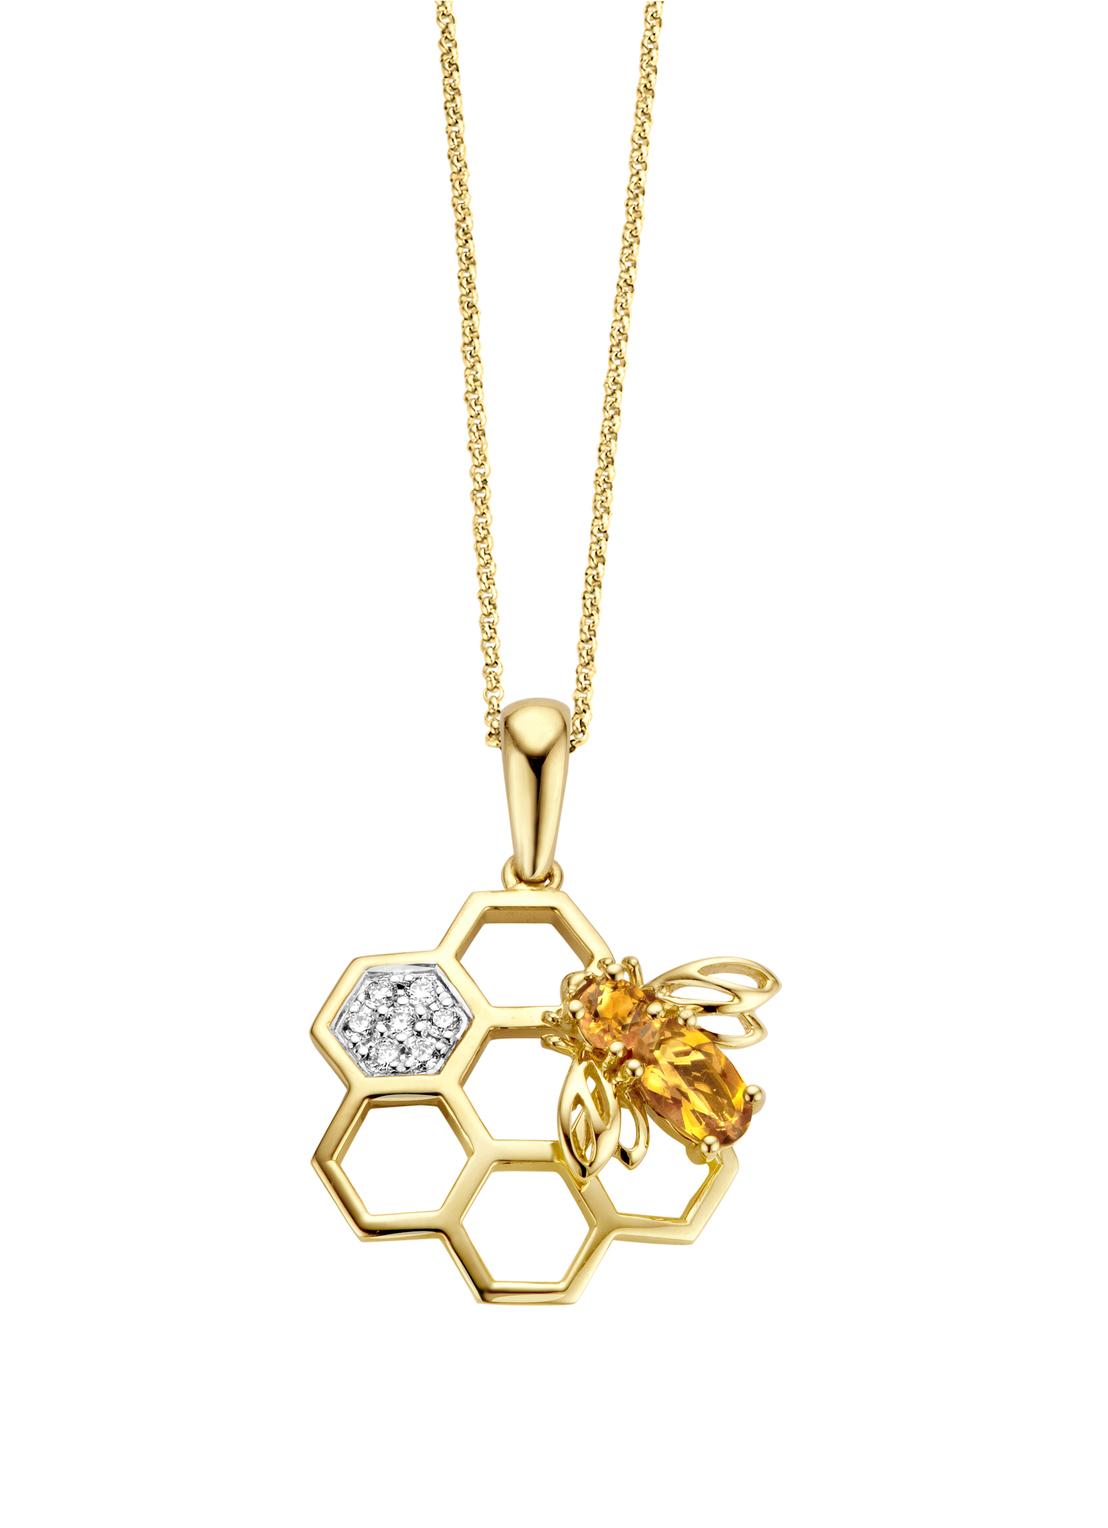 Queen Bee Pendant In 14 Karat Yellow Gold Pertaining To Most Recent Queen Bee Pendant Necklaces (View 4 of 25)